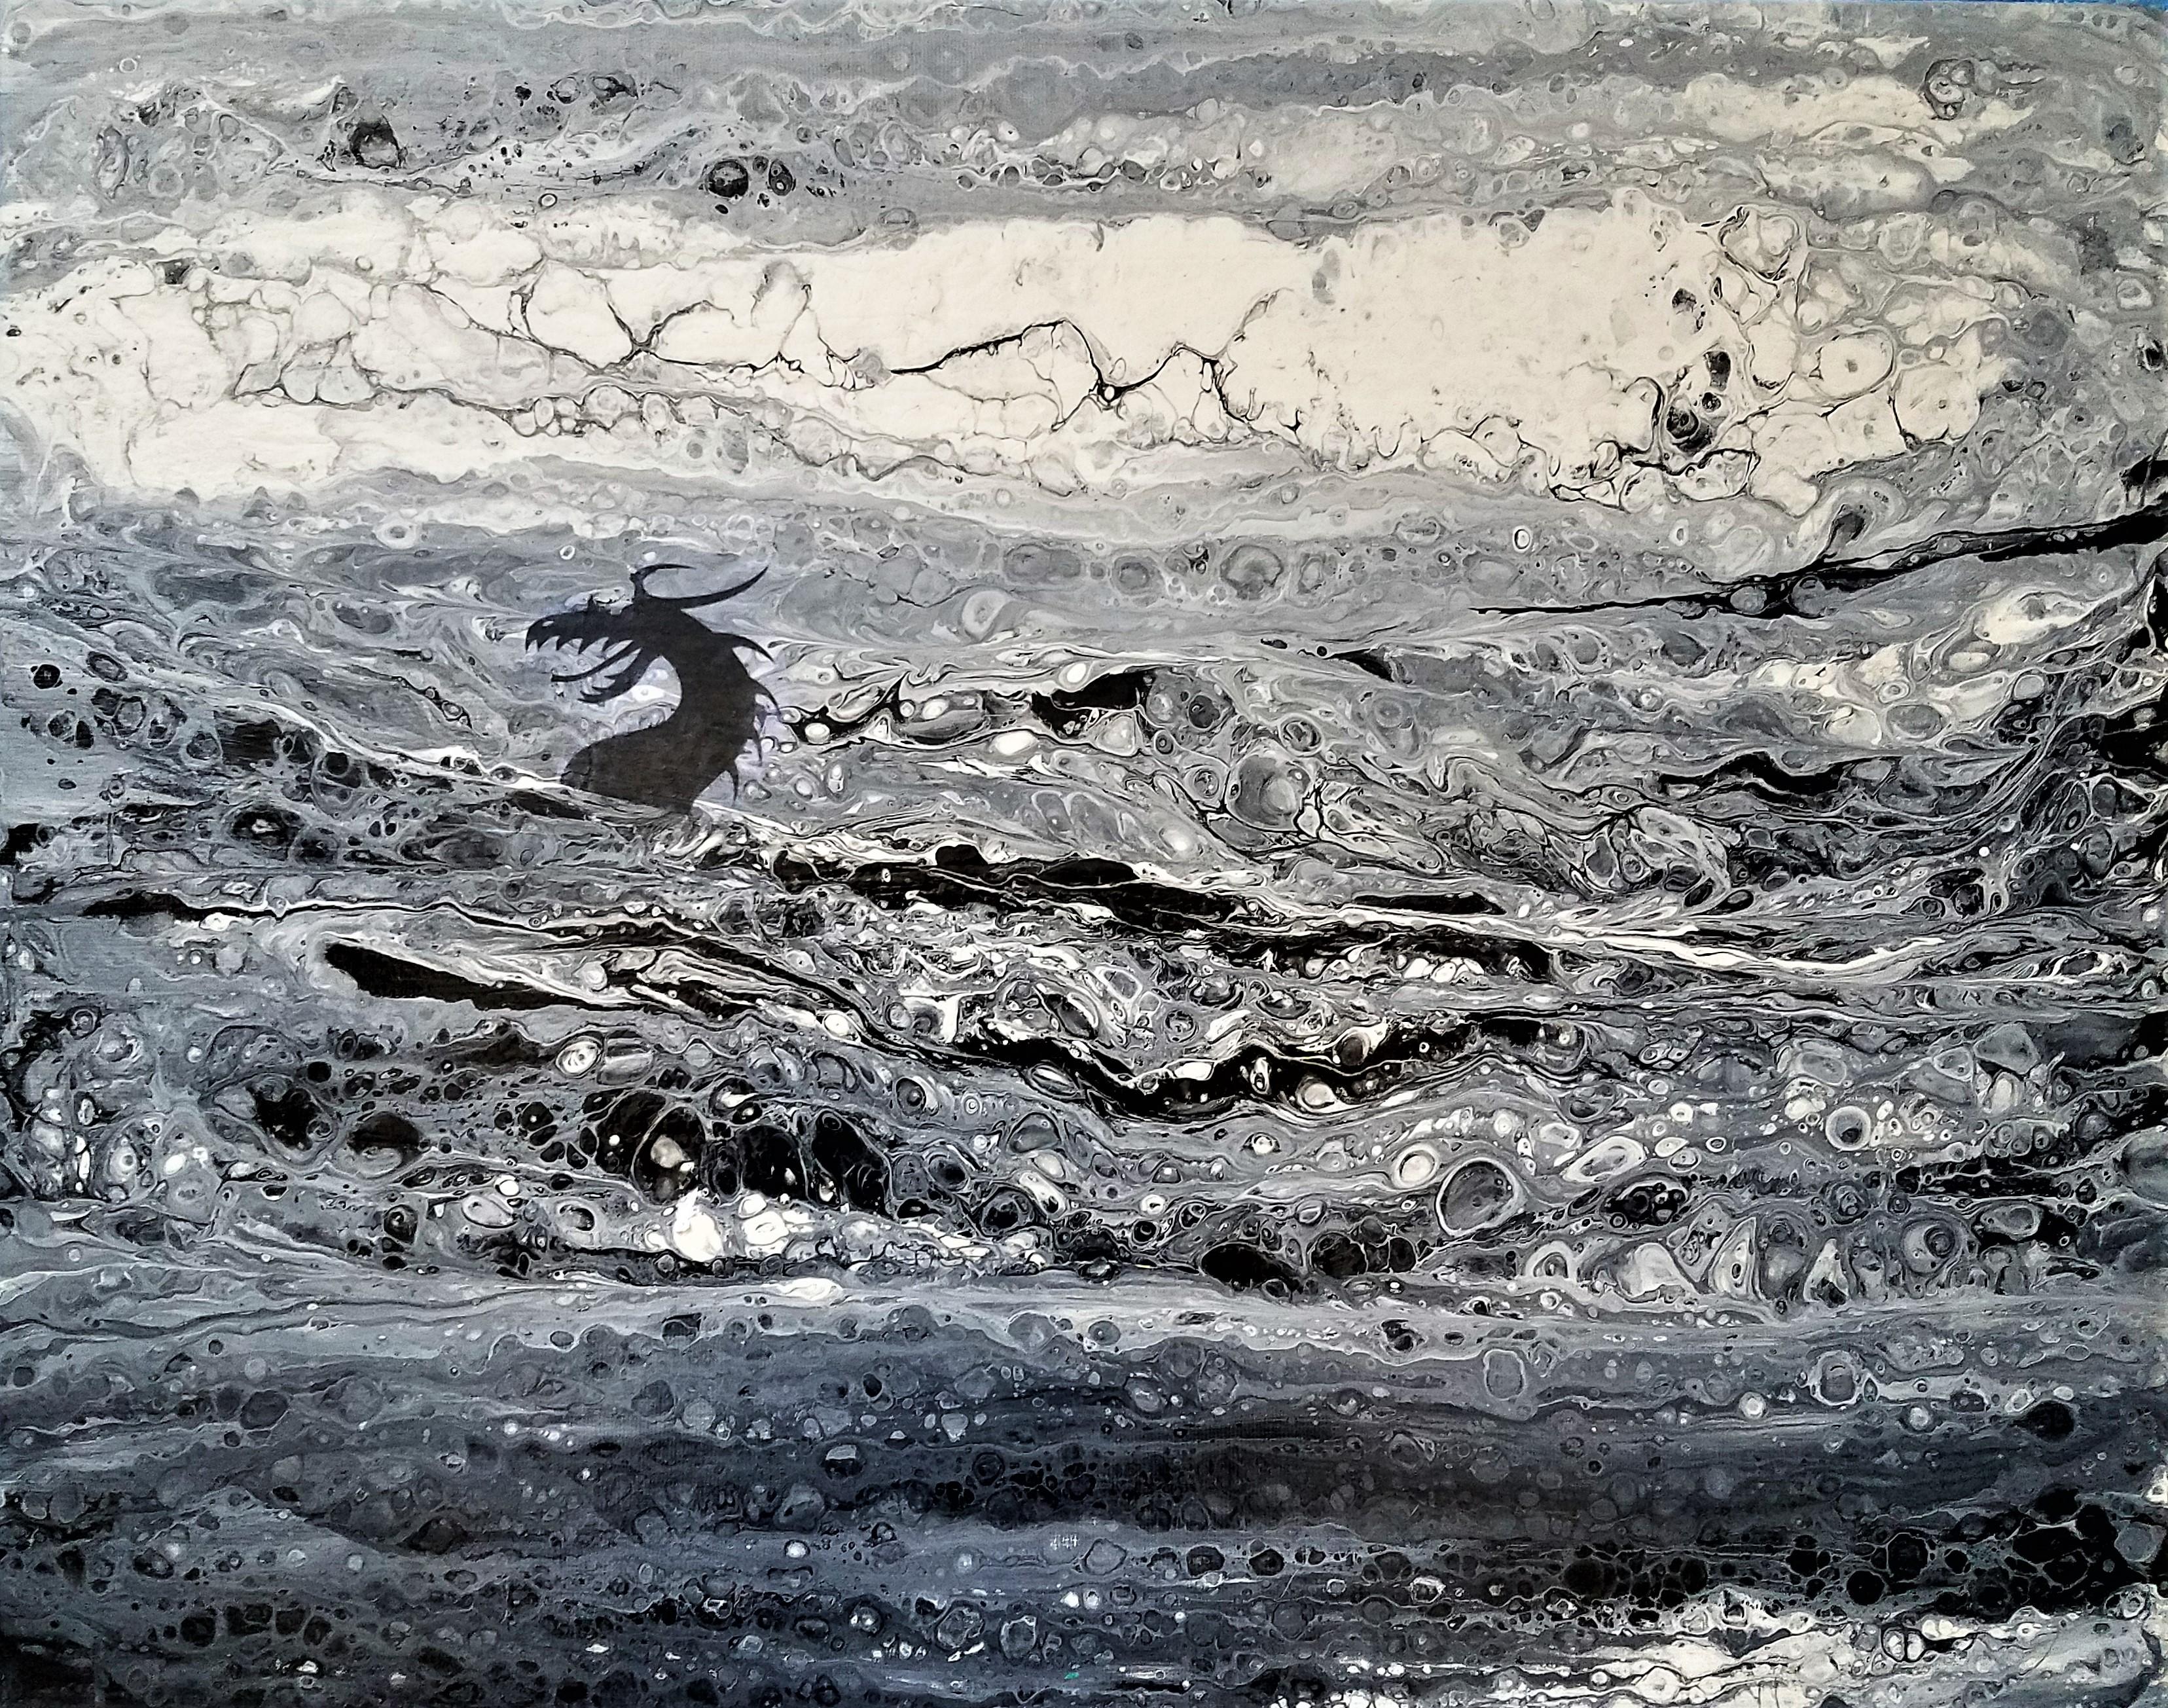 Black Water Dragon